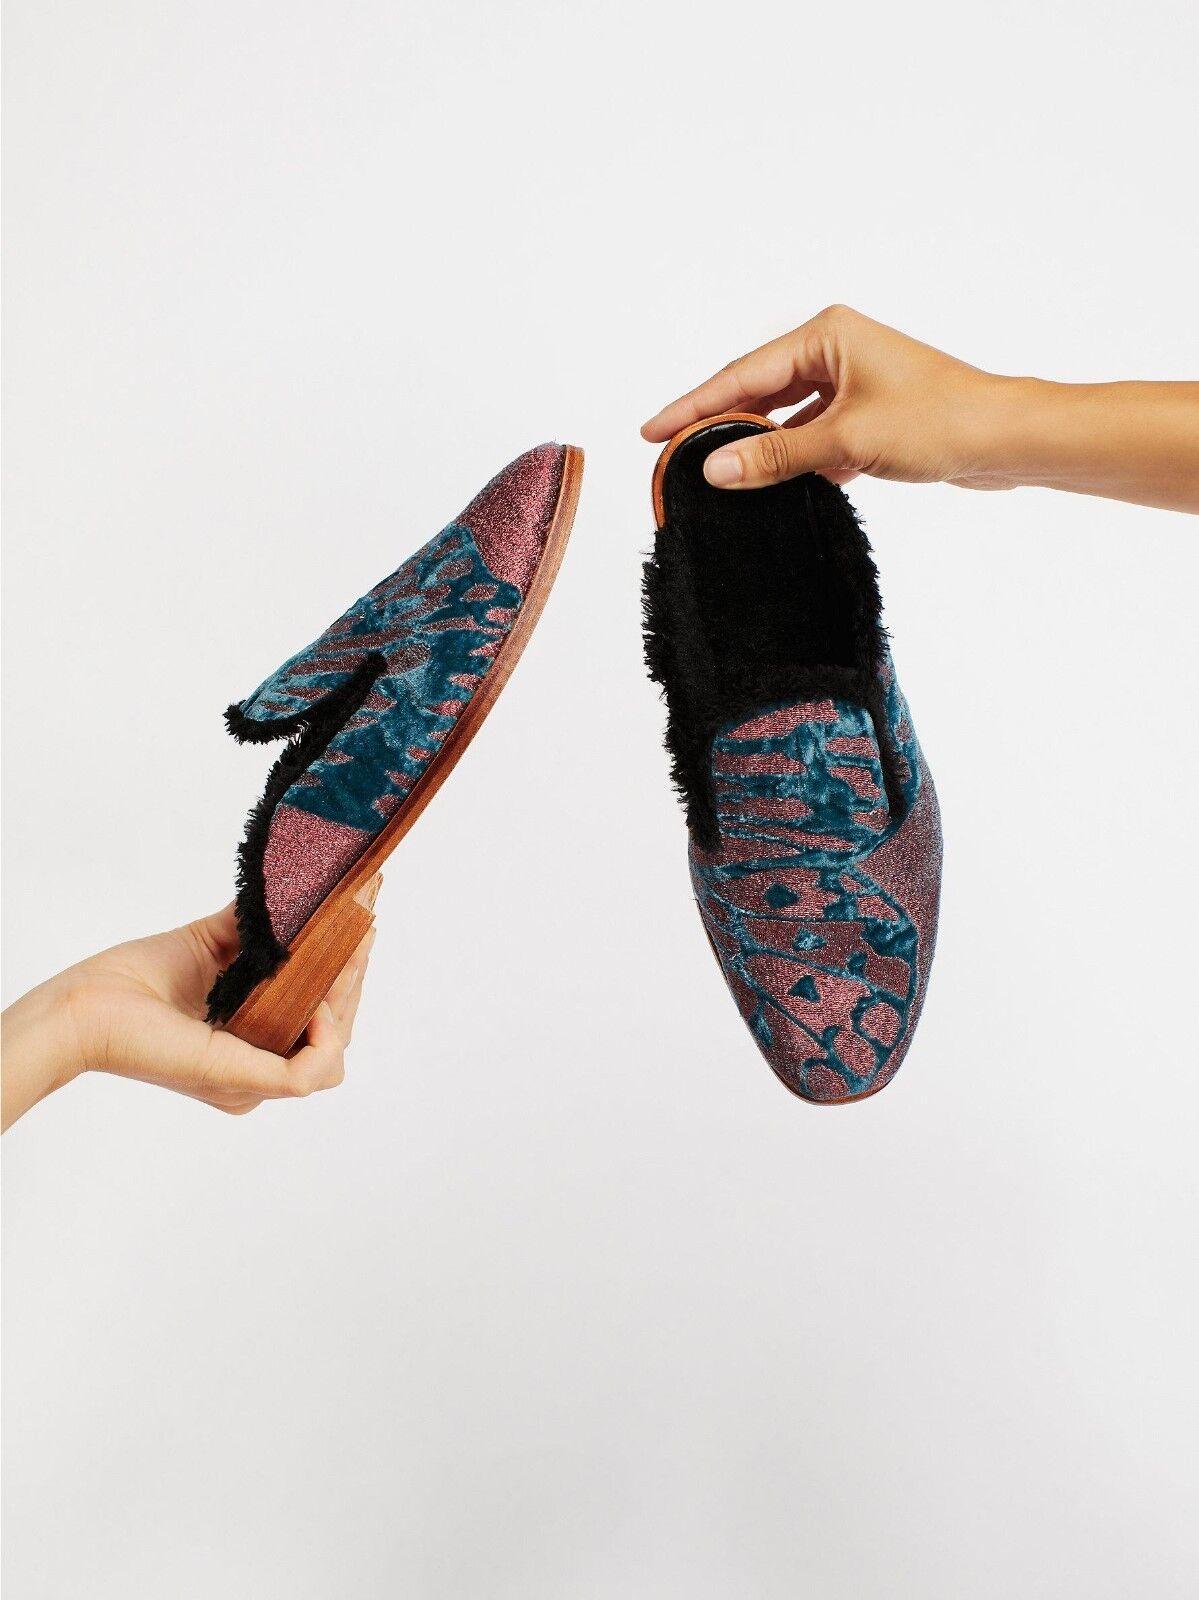 FREE PEOPLE Mule 39 BUTTERFLY EFFECT Velvet Faux Fur Lined chaussures rouge bleu 9 NIB